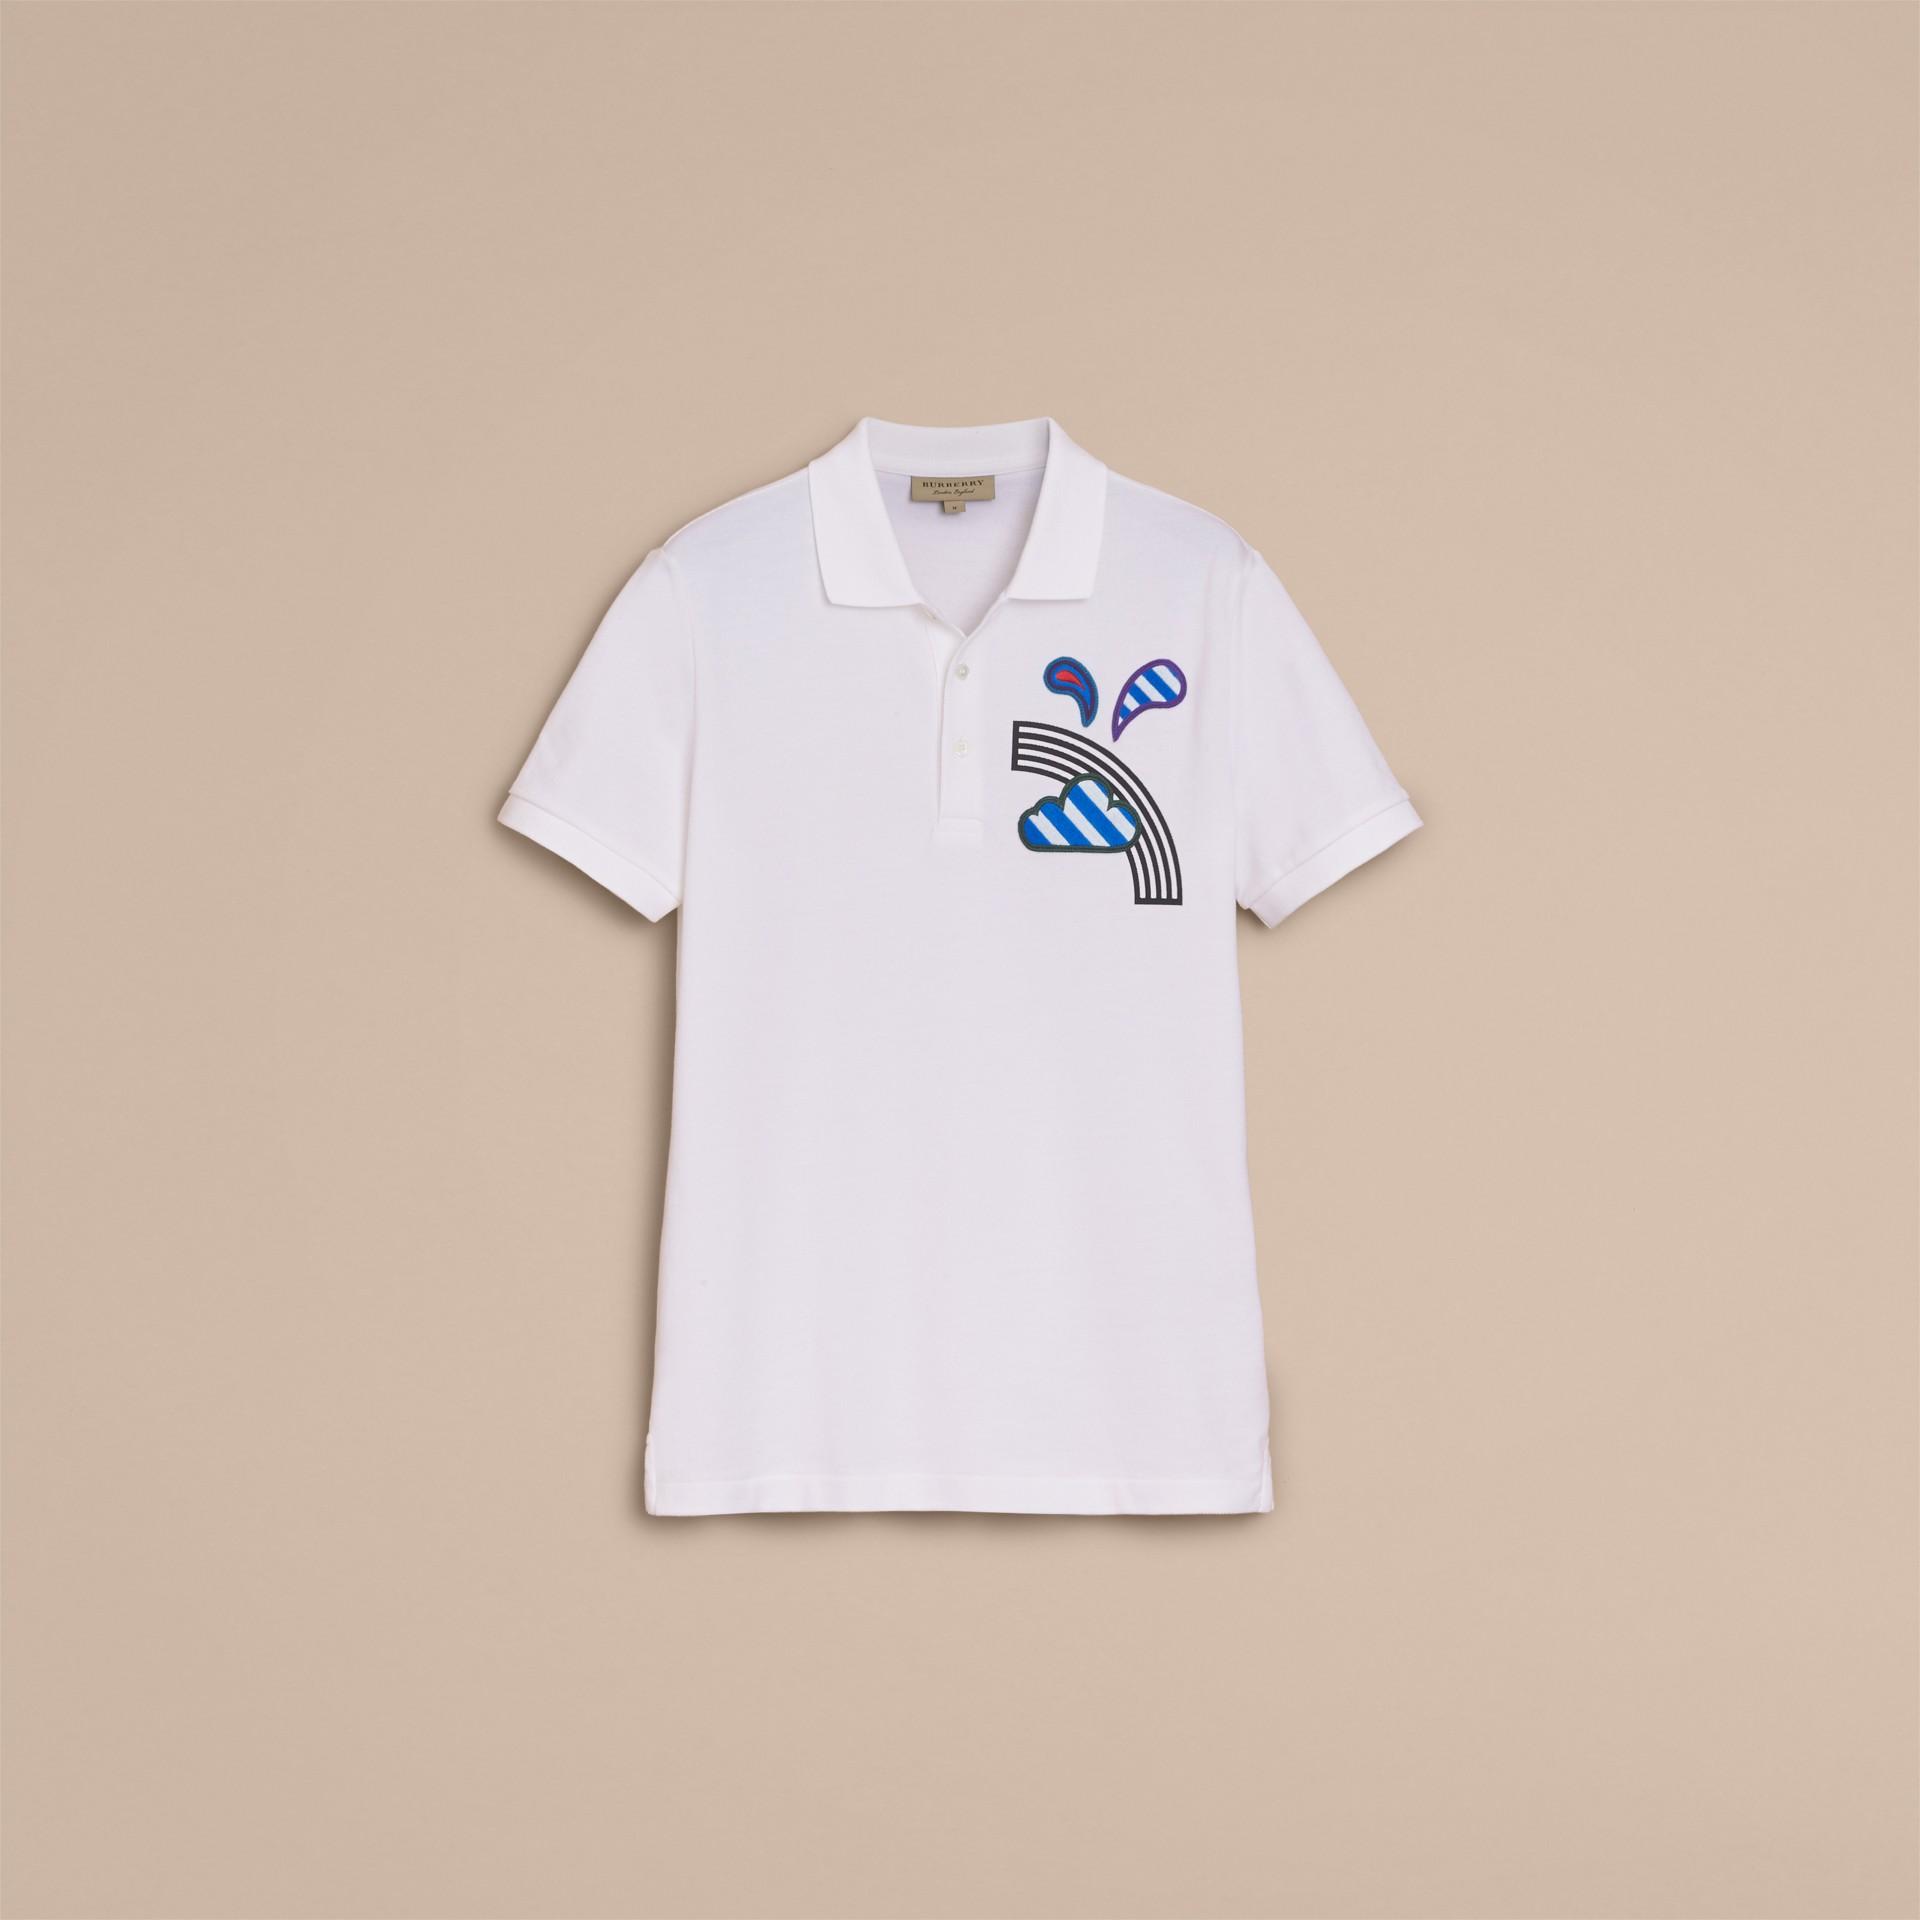 Weather Appliqué Cotton Piqué Polo Shirt White - gallery image 4